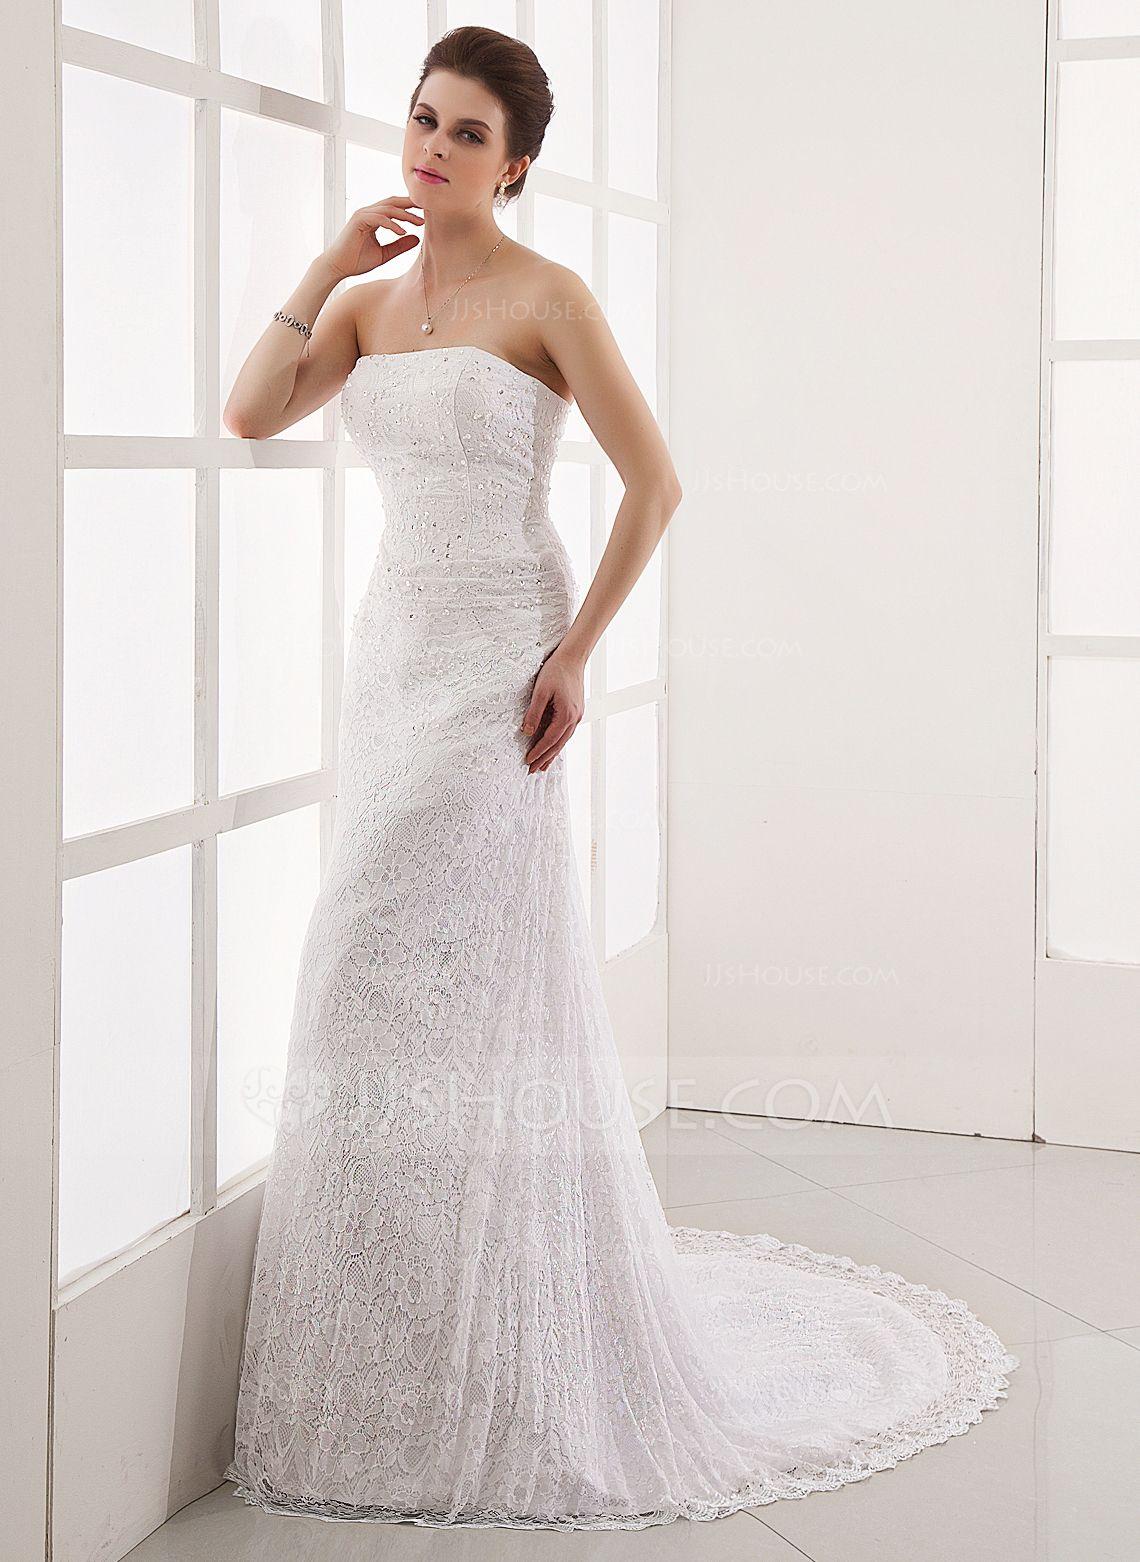 Alineprincess strapless court train lace wedding dress with